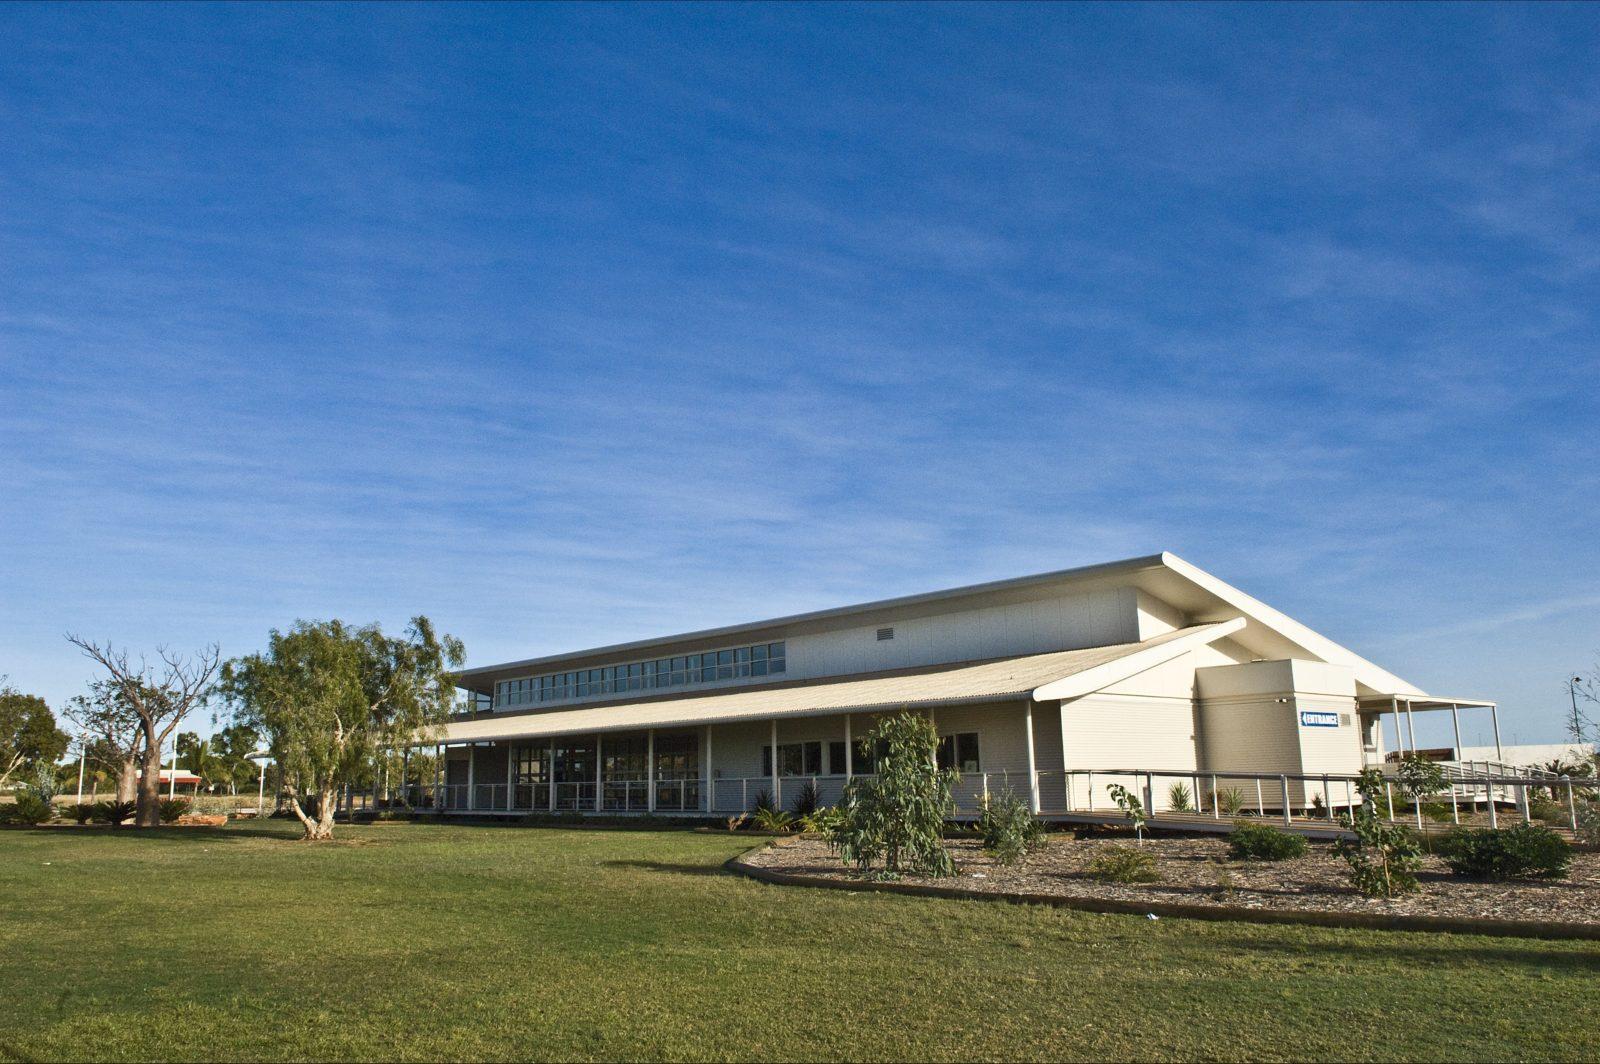 Broome Visitor Centre, Broome, Western Australia